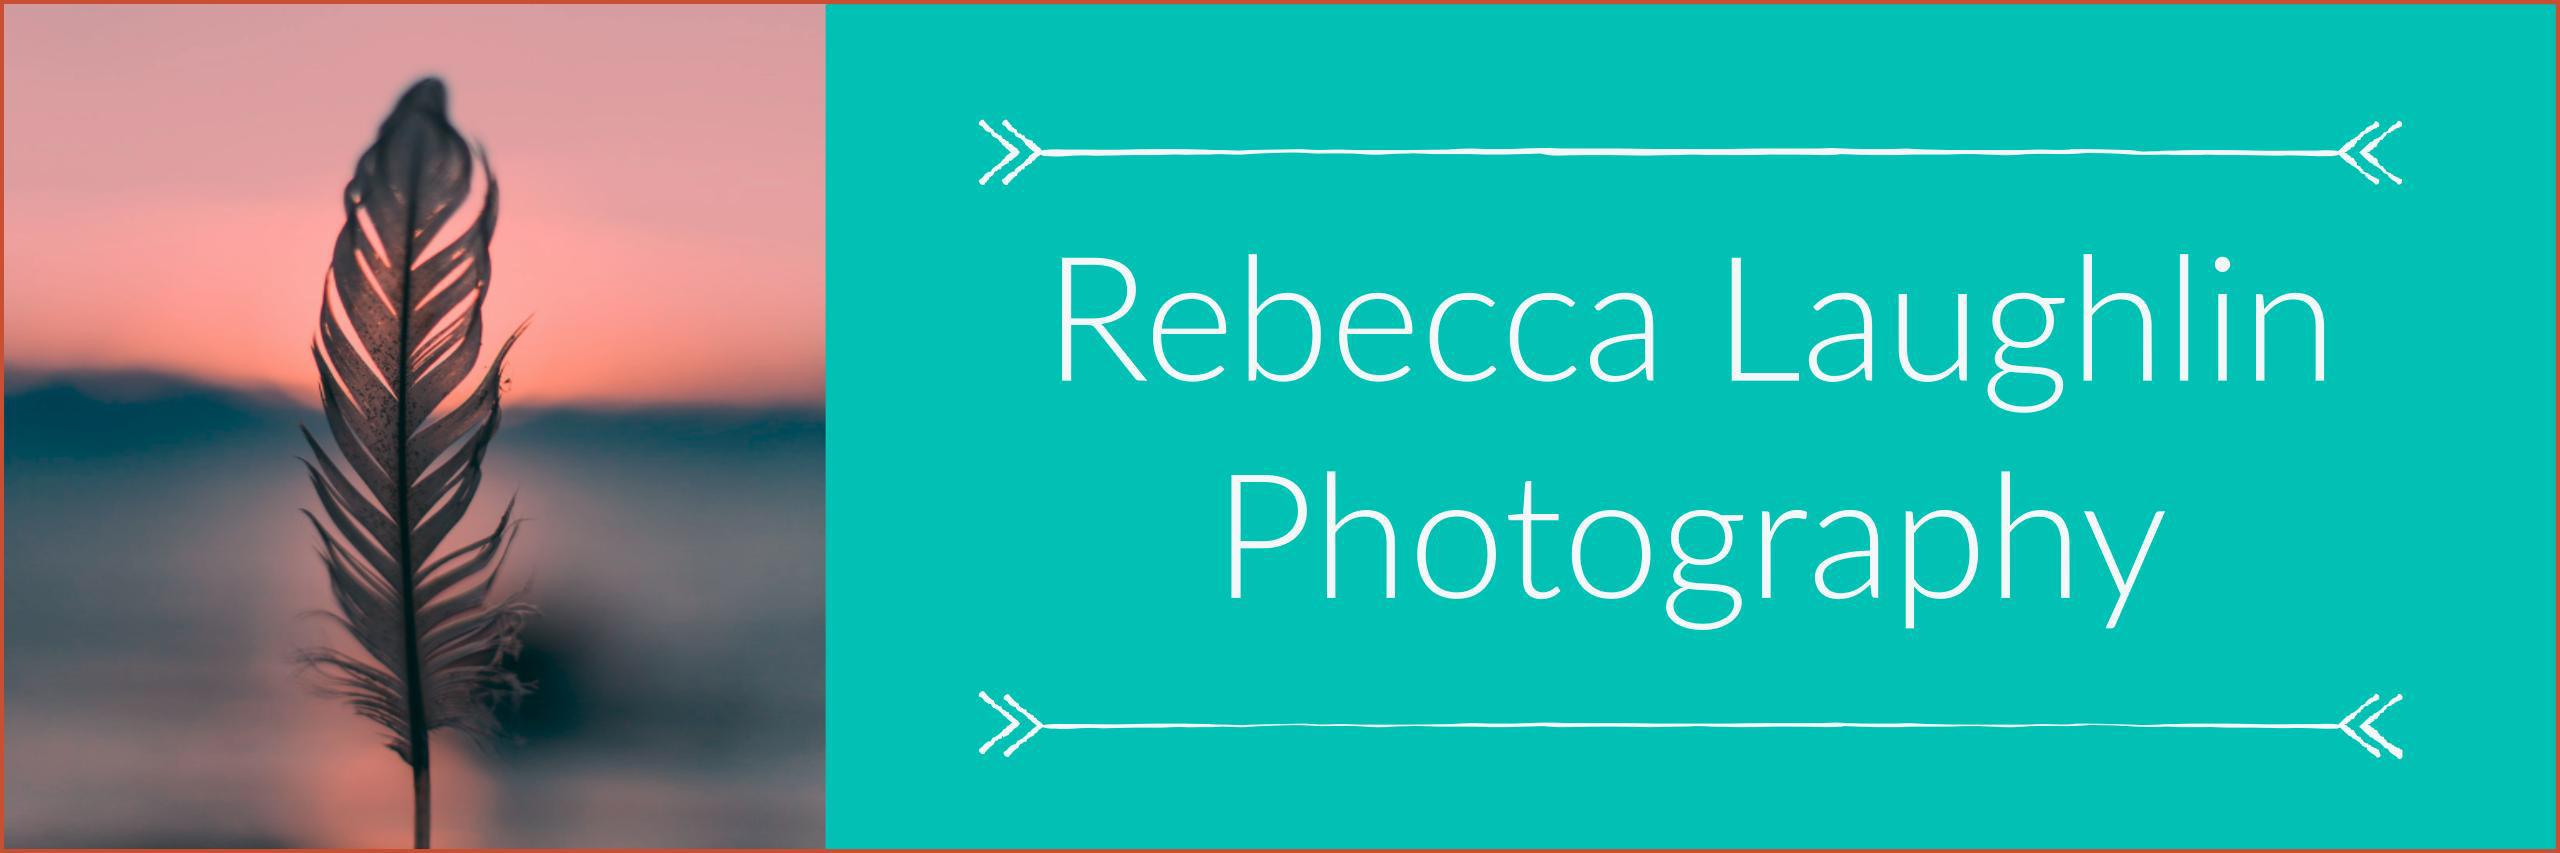 Rebecca Laughlin Photography